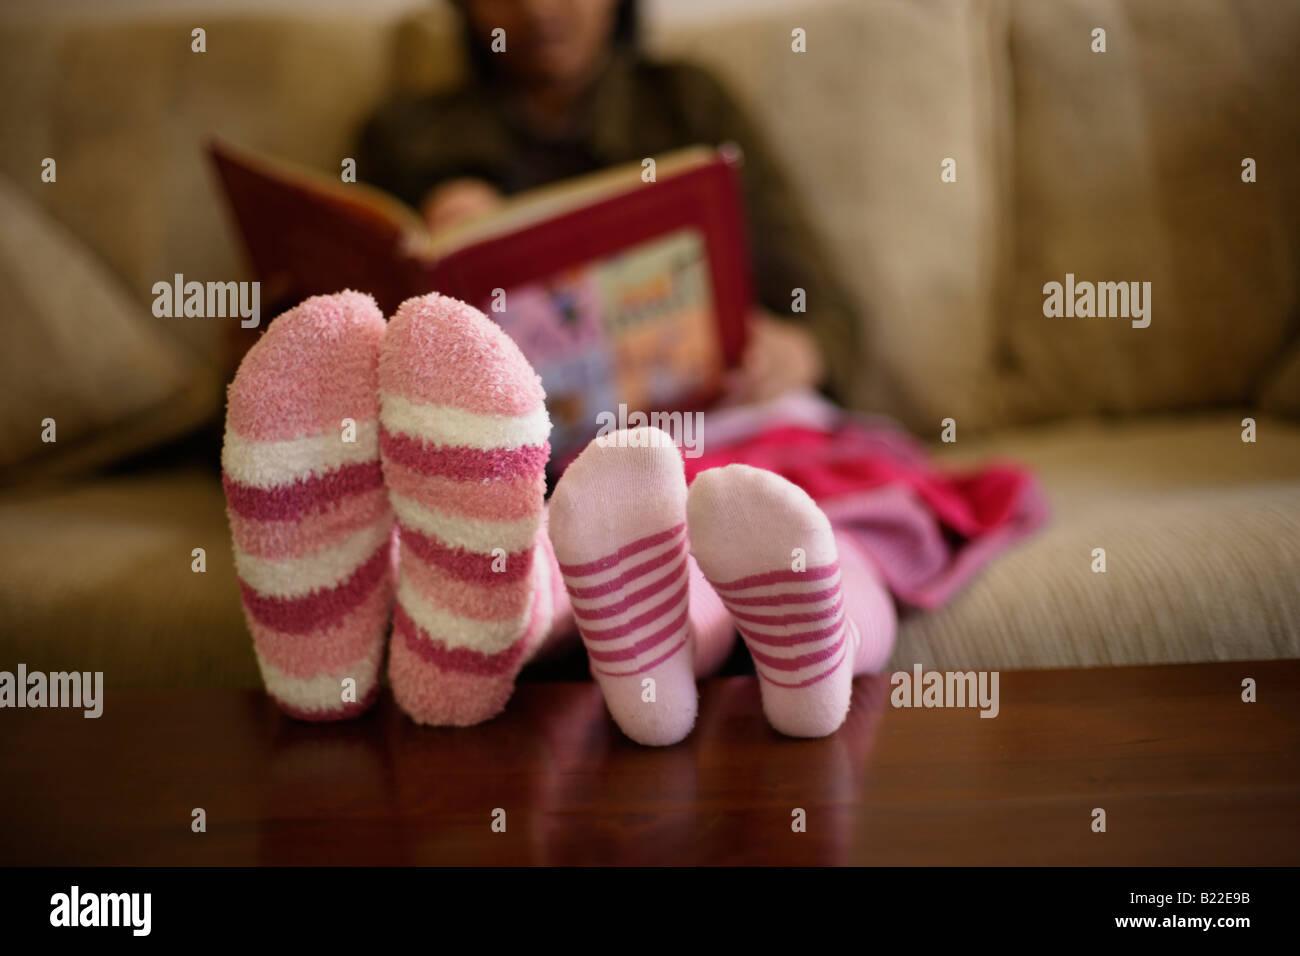 Madre India 30s e hija de raza mixta 4 leer un libro llevaba calcetines de rayas rosa Imagen De Stock